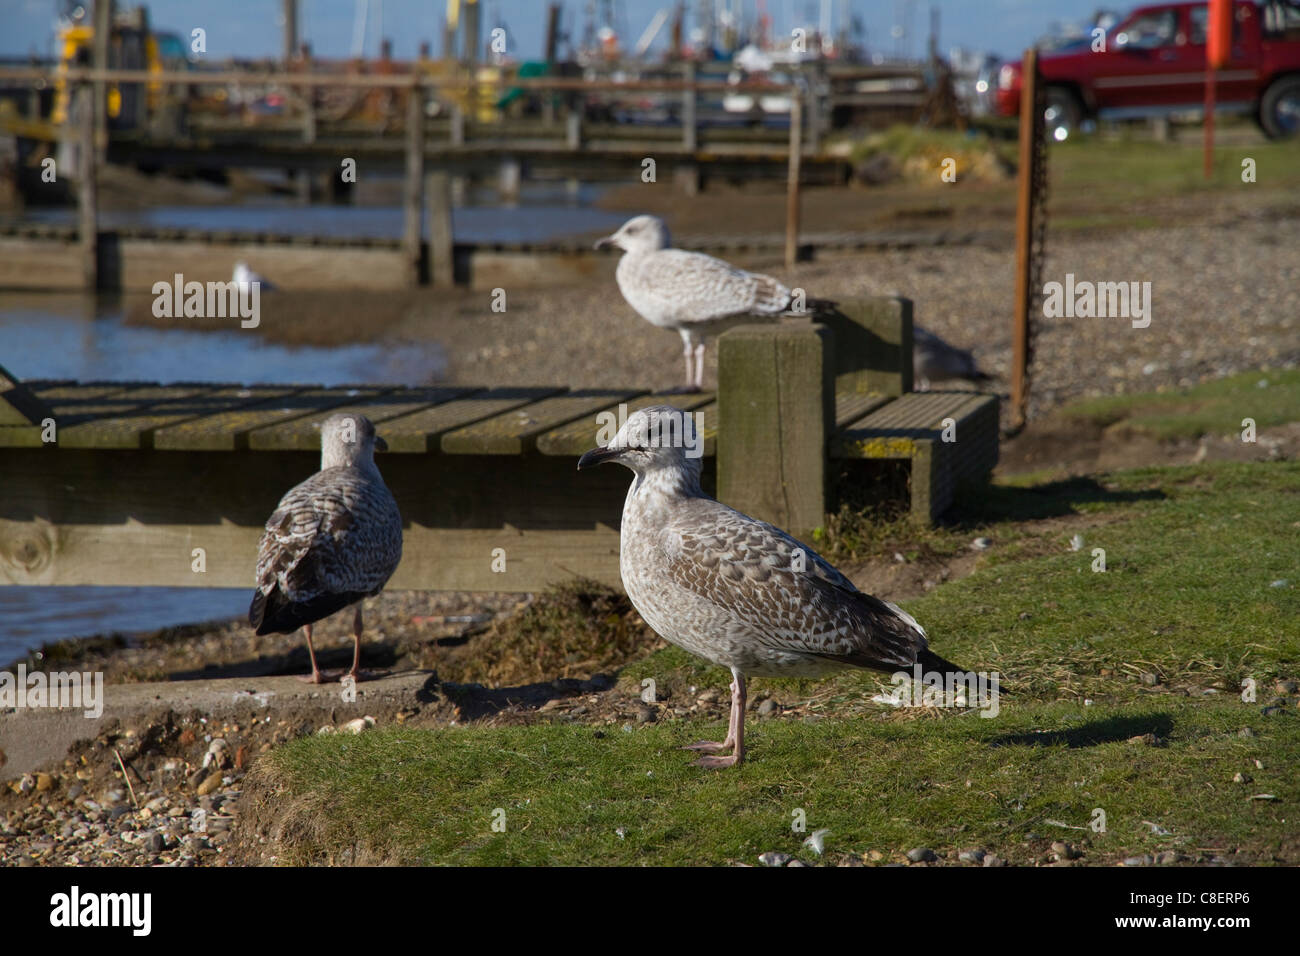 Herring gulls (Larus argentatus) at Southwold Harbour in Suffolk - Stock Image